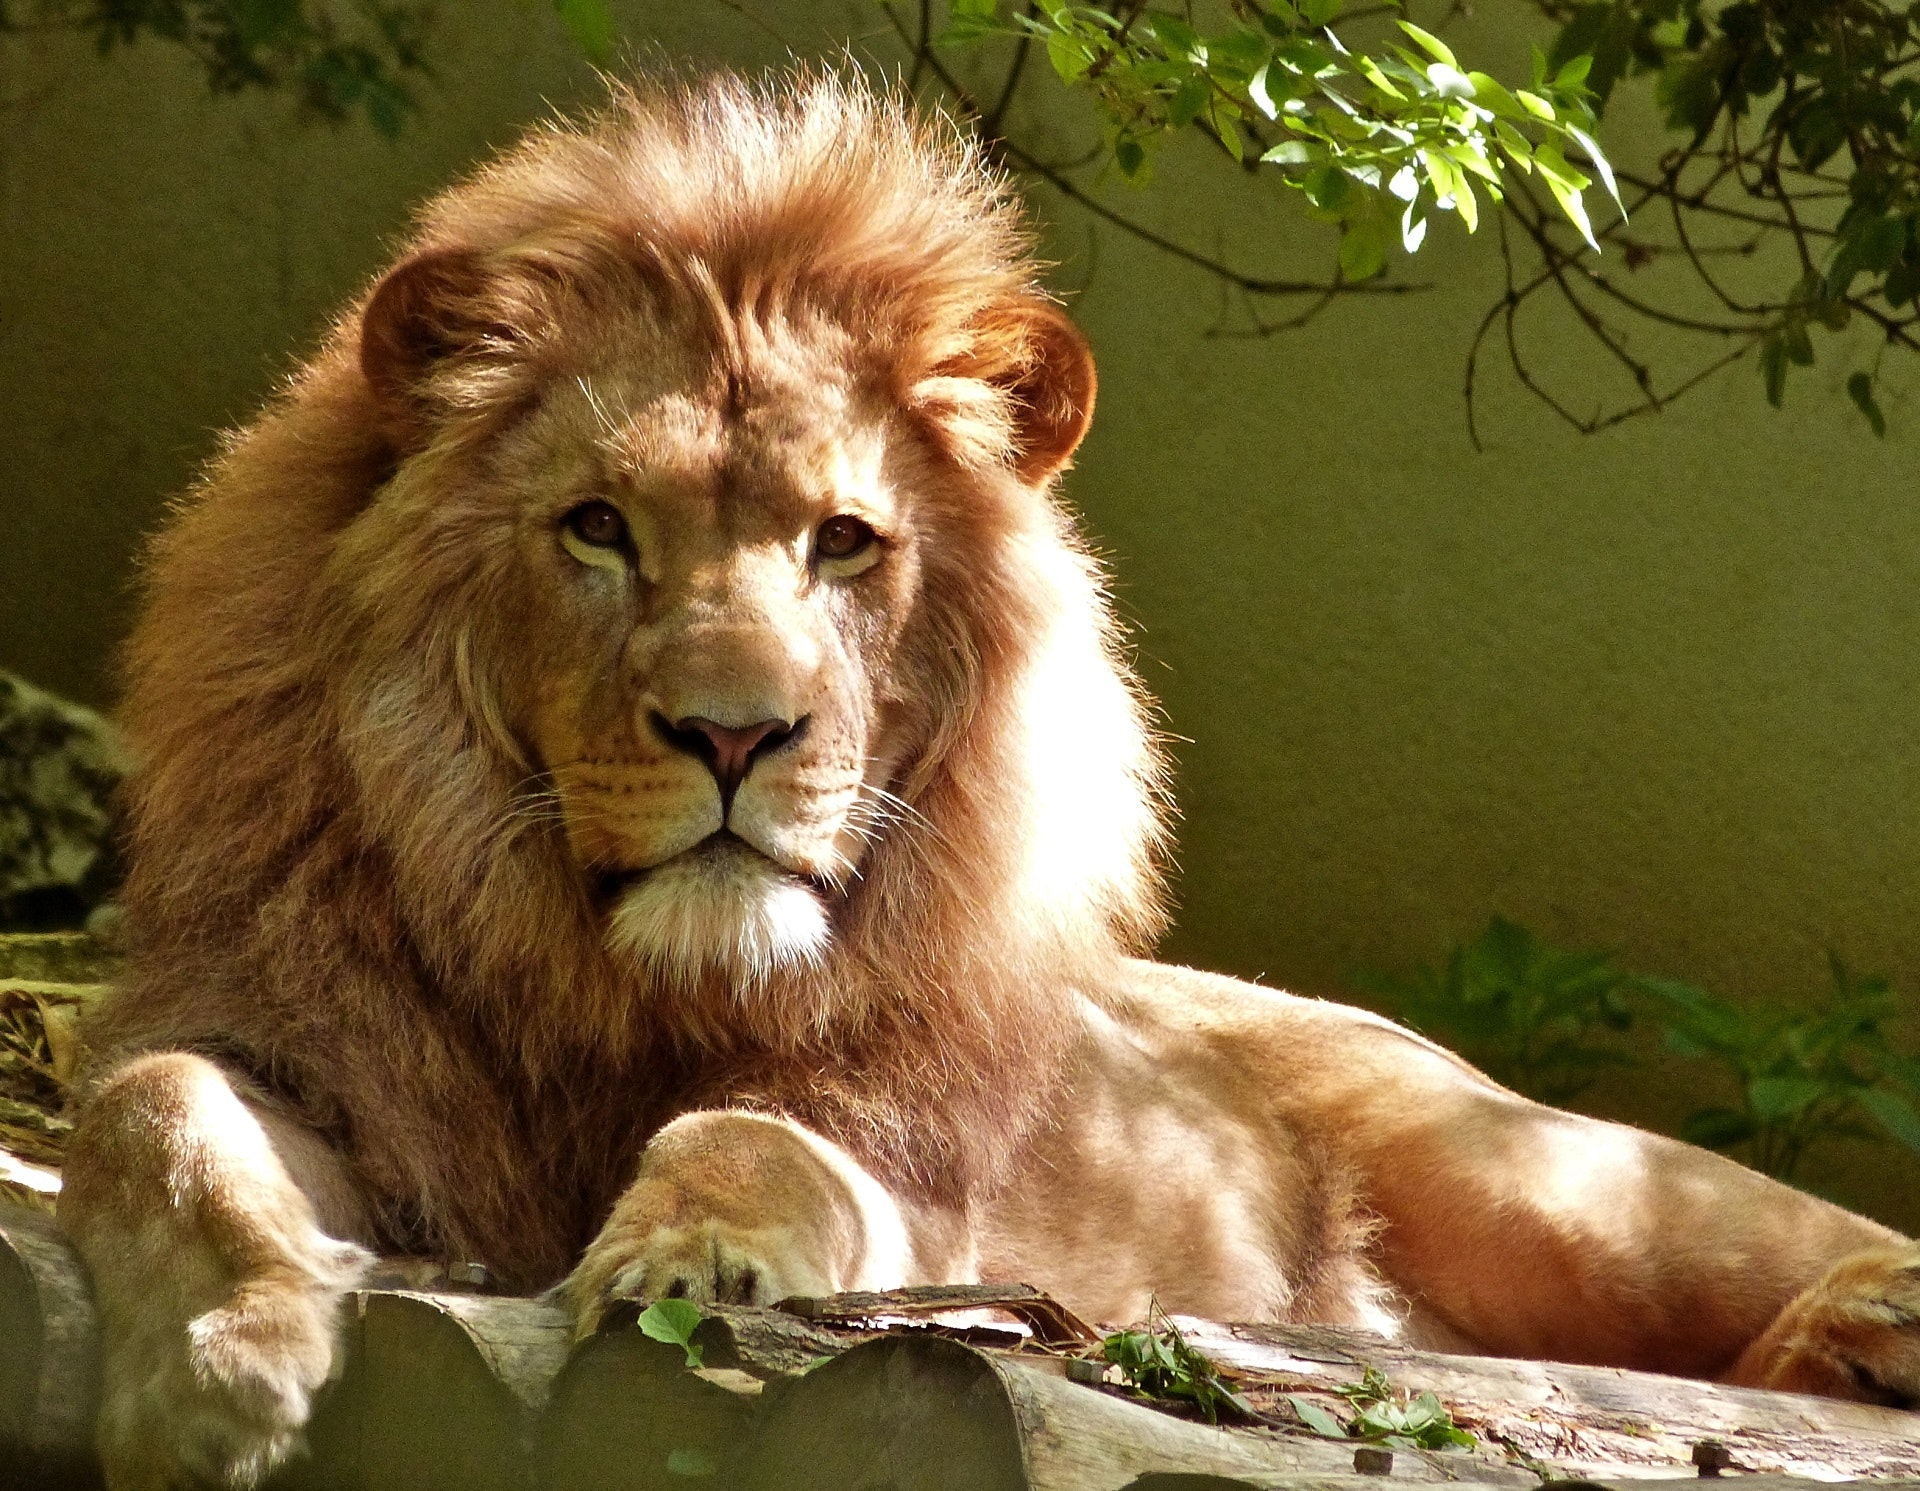 Zoo keeper pentru o zi